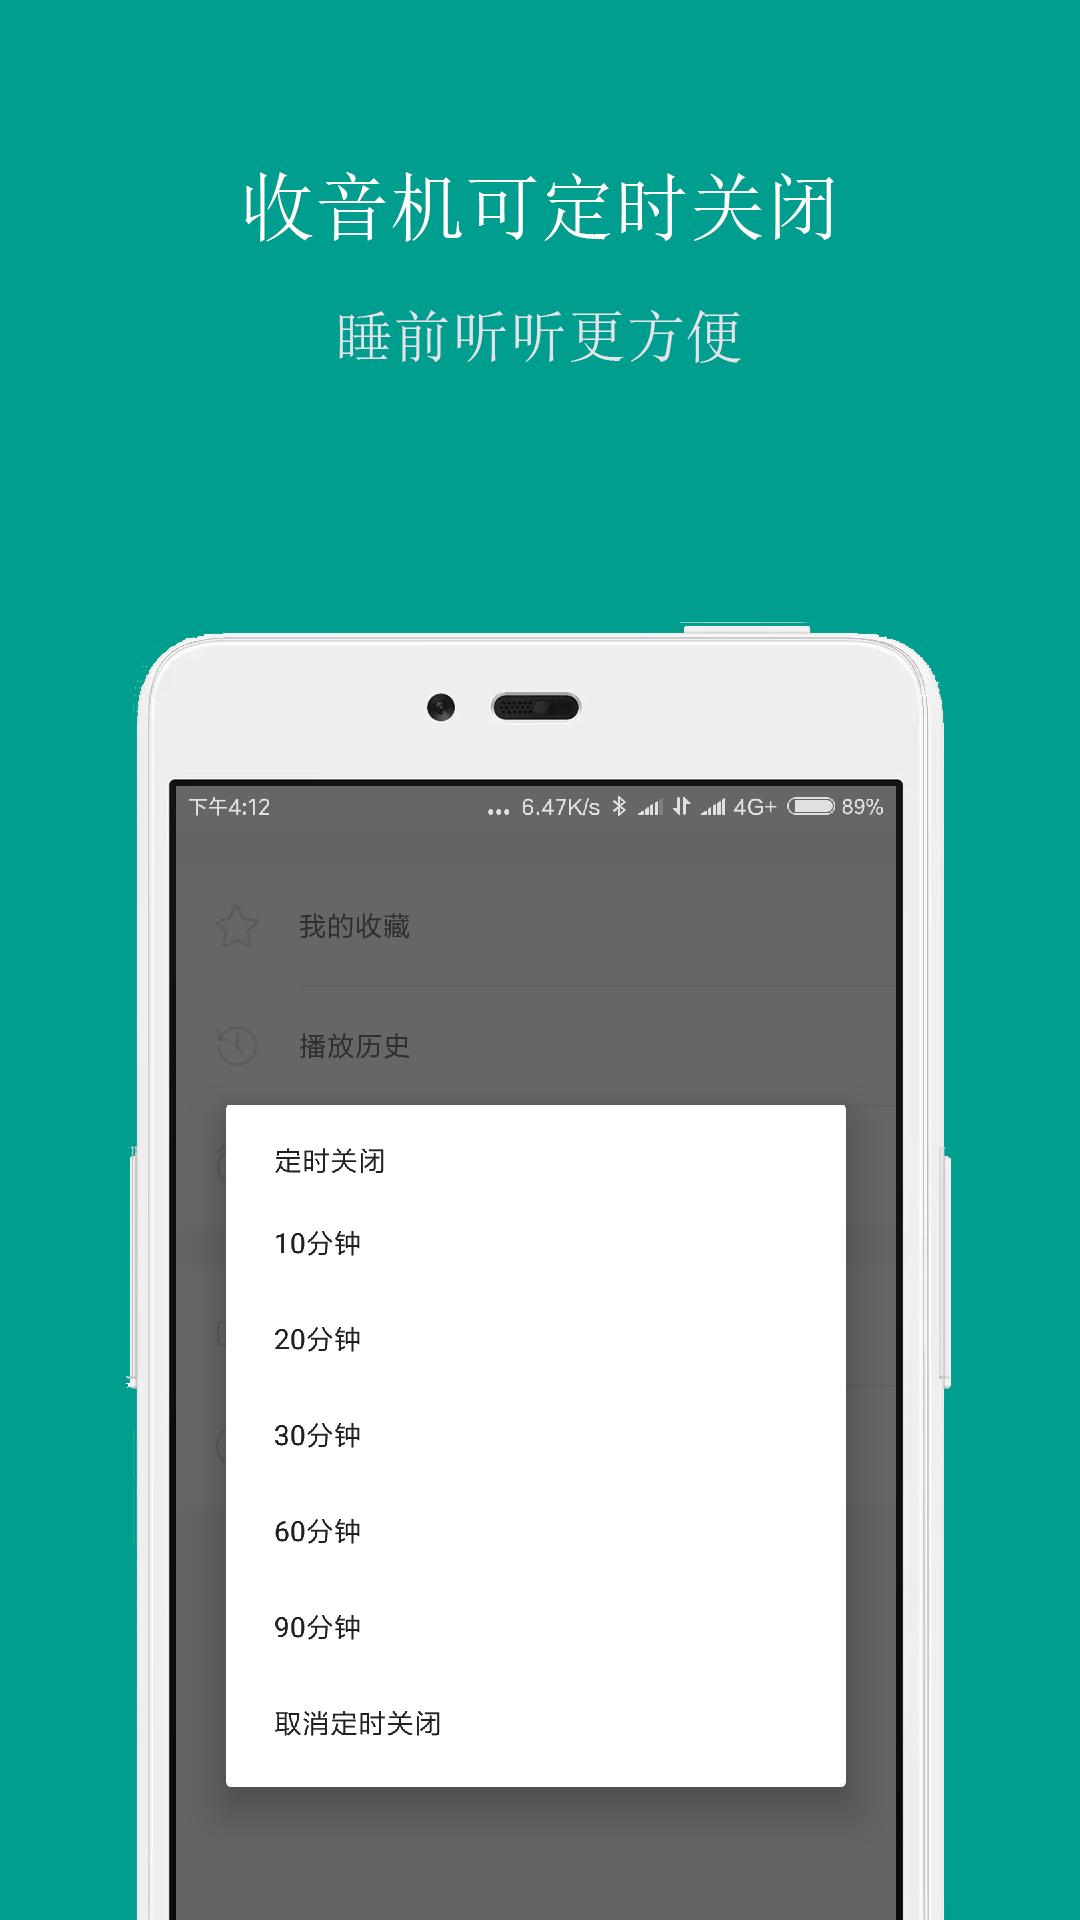 FM手机调频收音机去广告版 V3.6.0 安卓版截图4